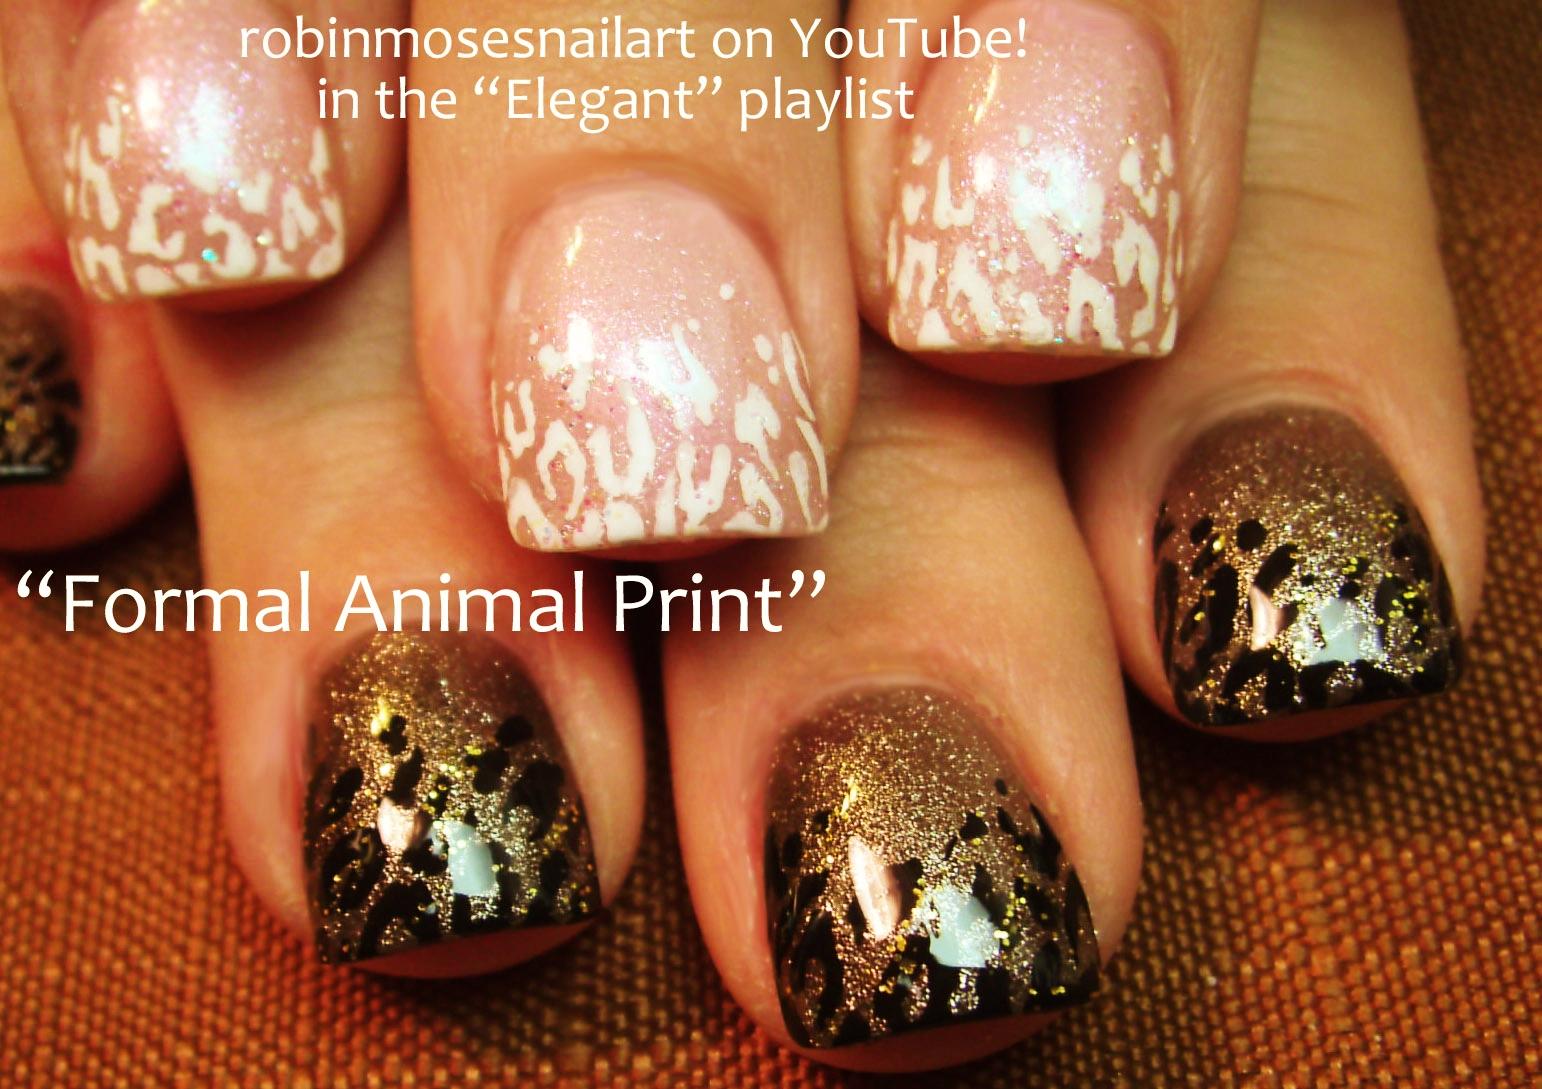 wedding animal print nails 2 designs in 1 nails nail art for weddings a wedding nails black leopard print white leopard print wedding nails ... & wedding animal print nails 2 designs in 1 nails nail art for ...